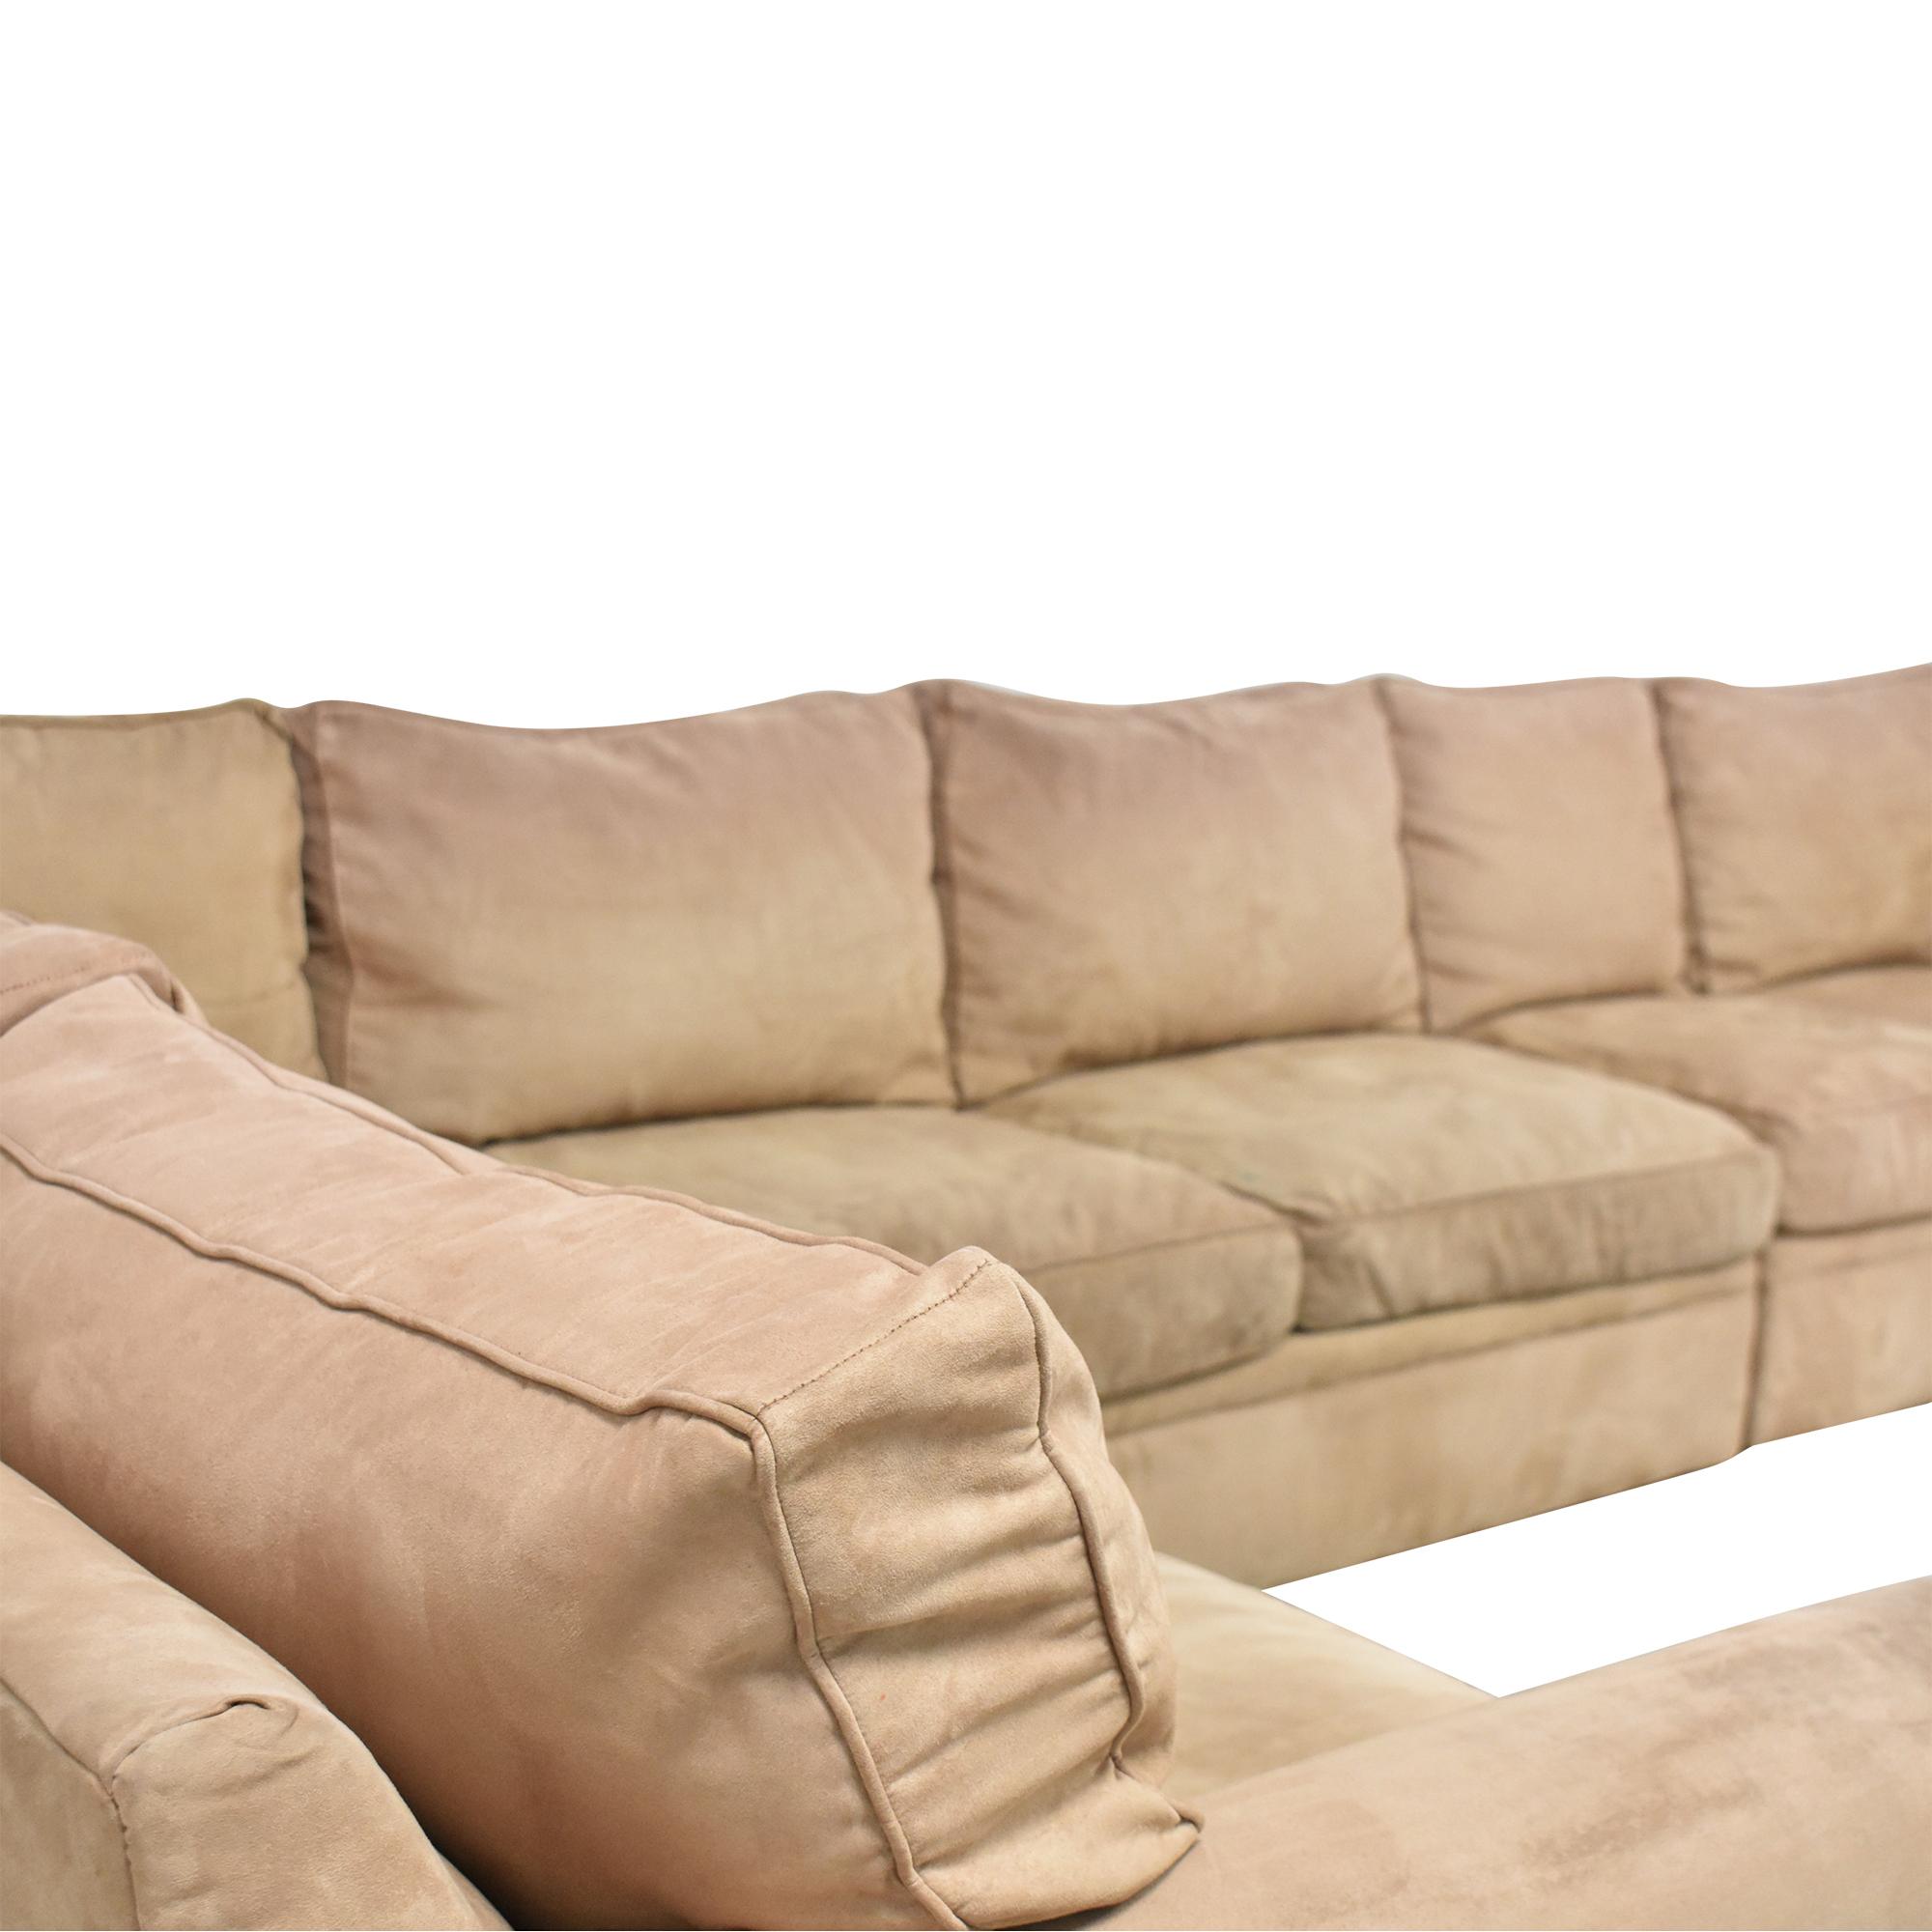 Rowe Furniture Rowe Furniture Corner Sectional Sofa dimensions